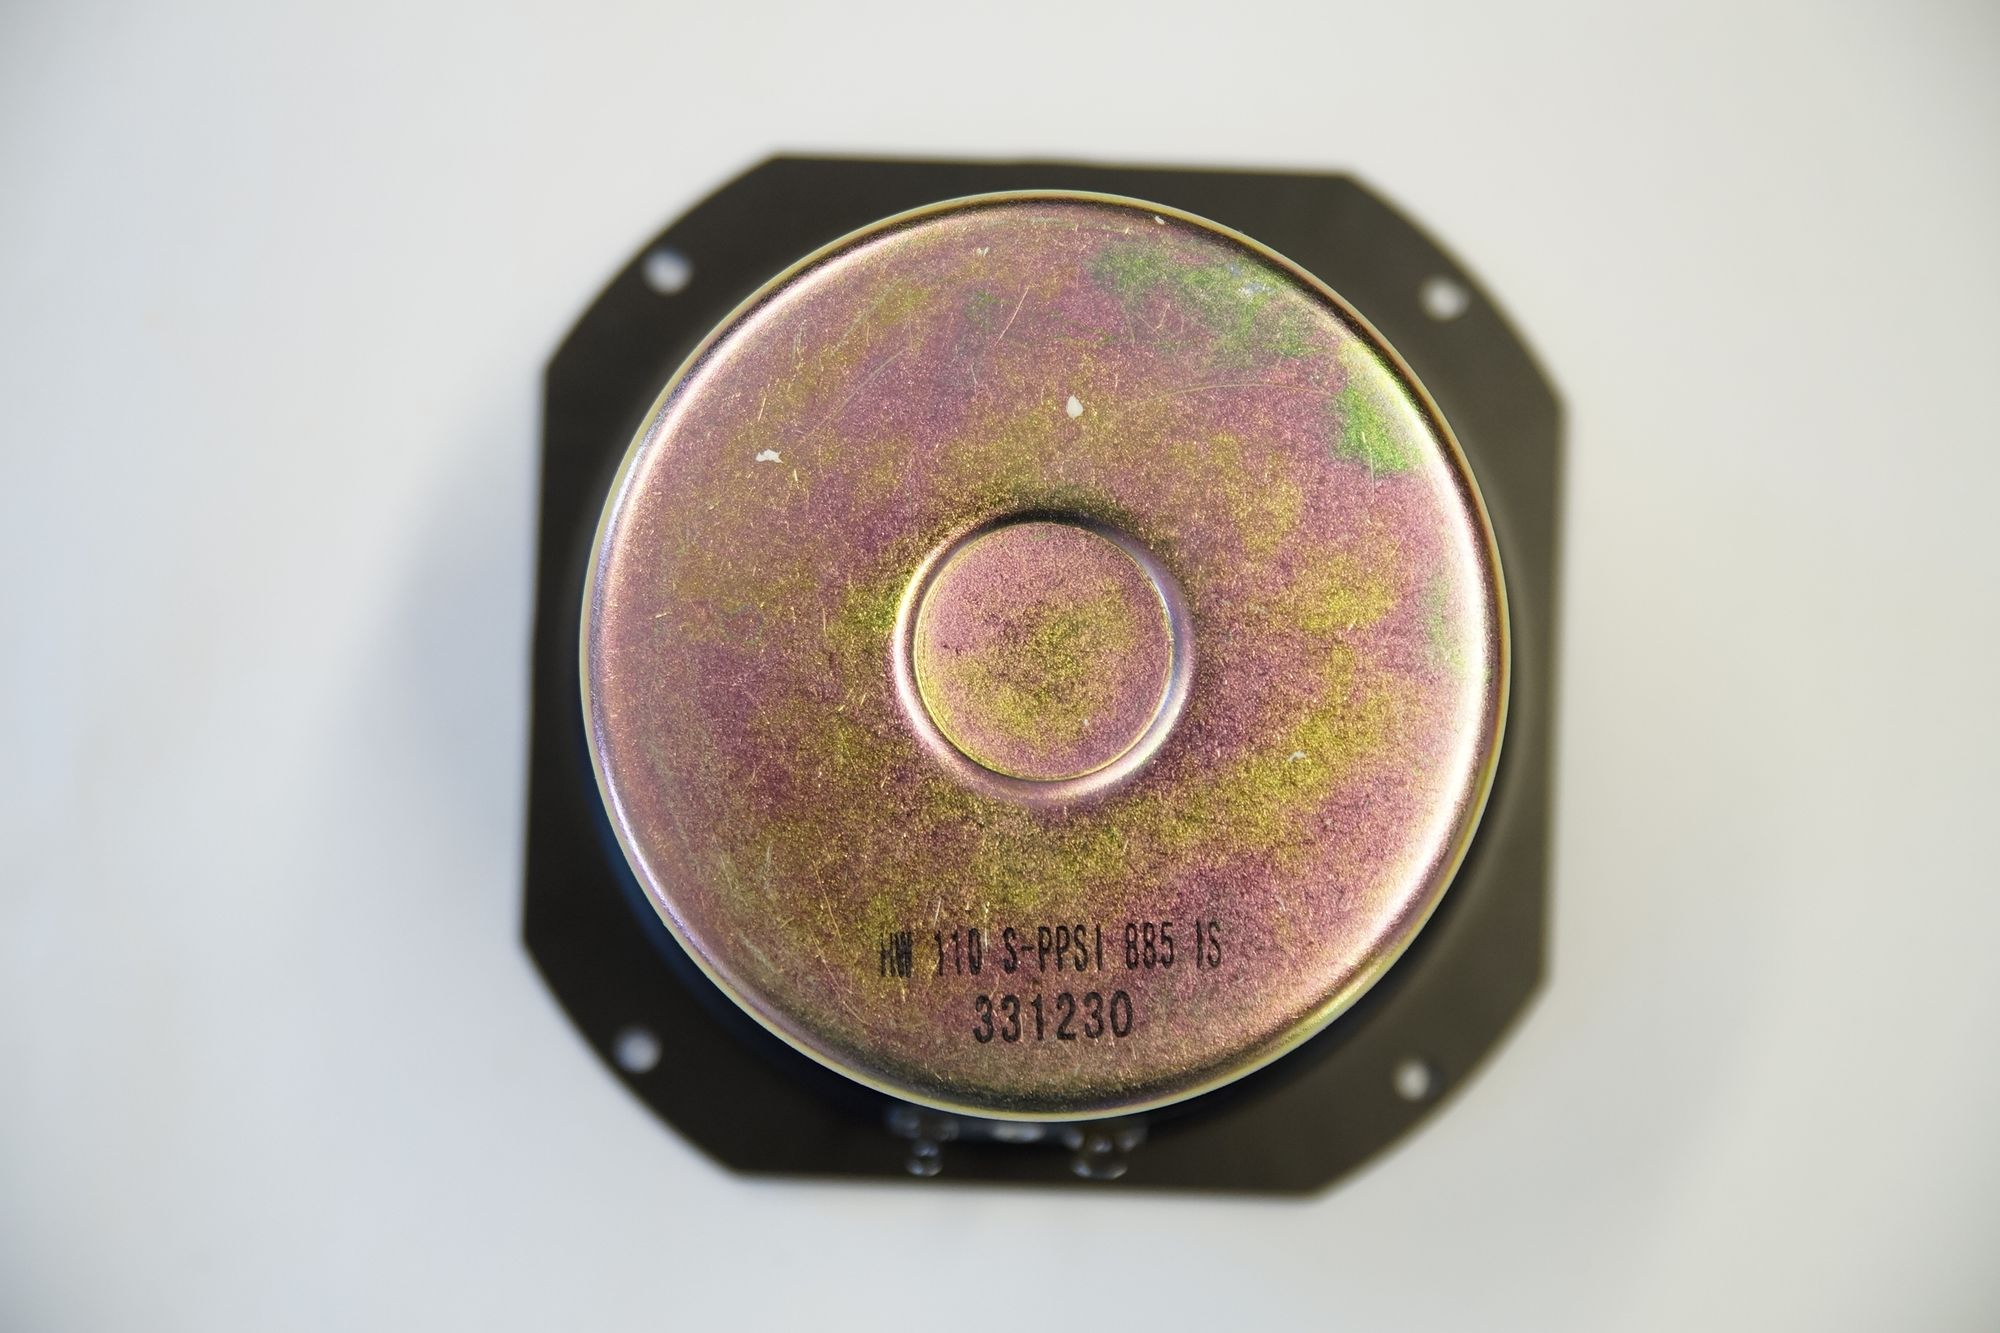 1 Stück Heco 110 mm Tiefmitteltöner HW 110 S-PPSI 885 IS Serviceware – Bild 3